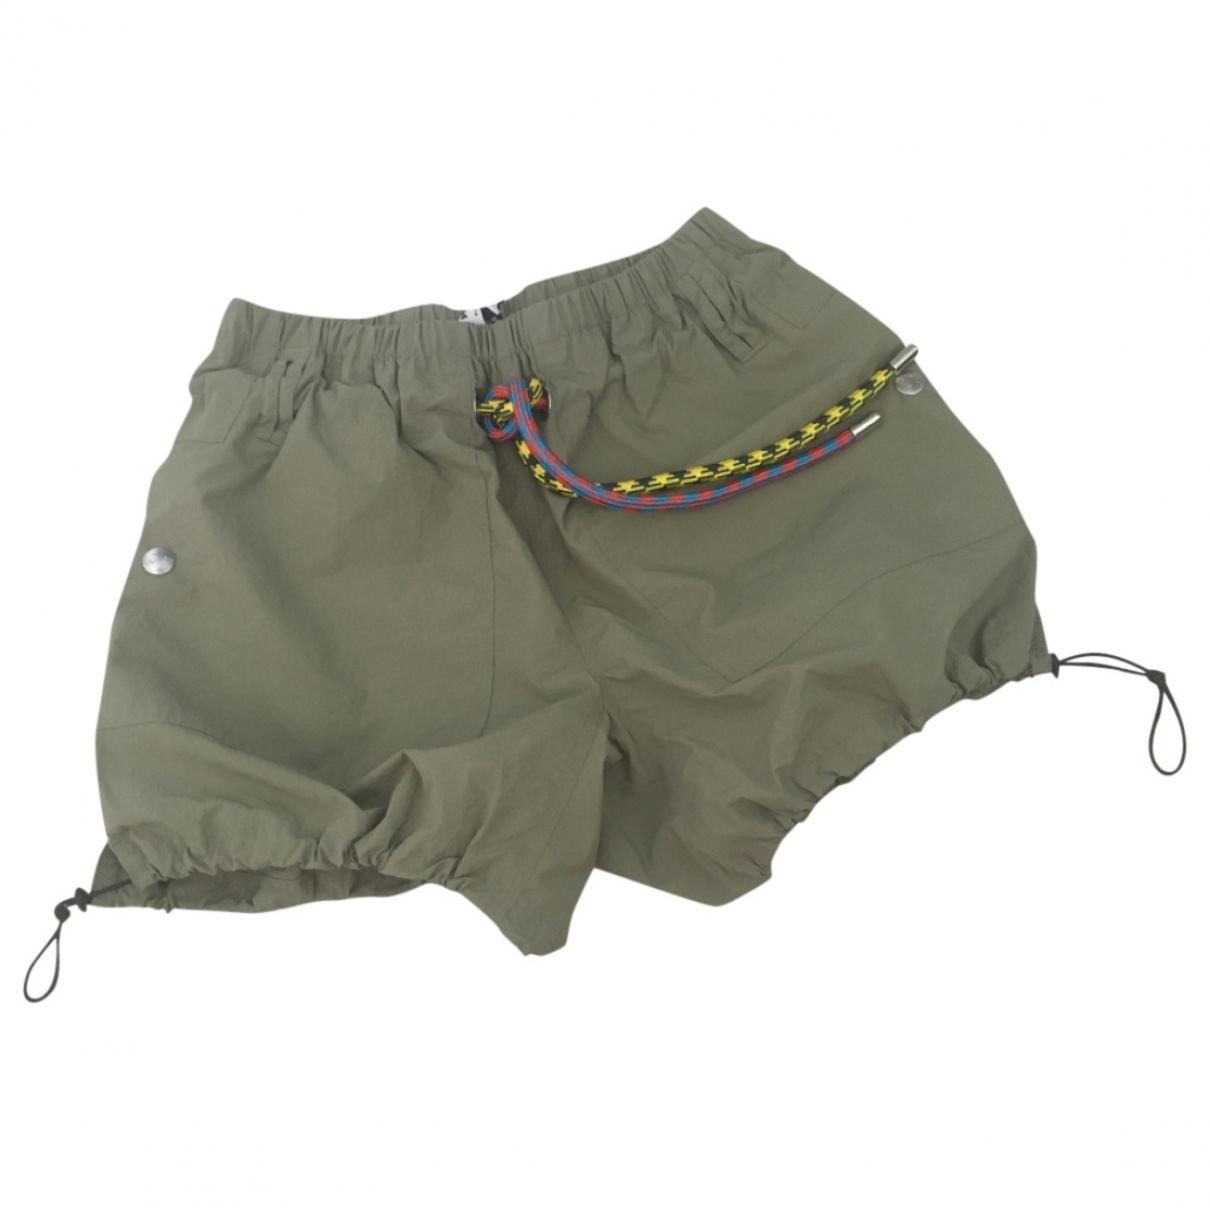 Proenza Schouler \N Khaki Shorts for Women S International